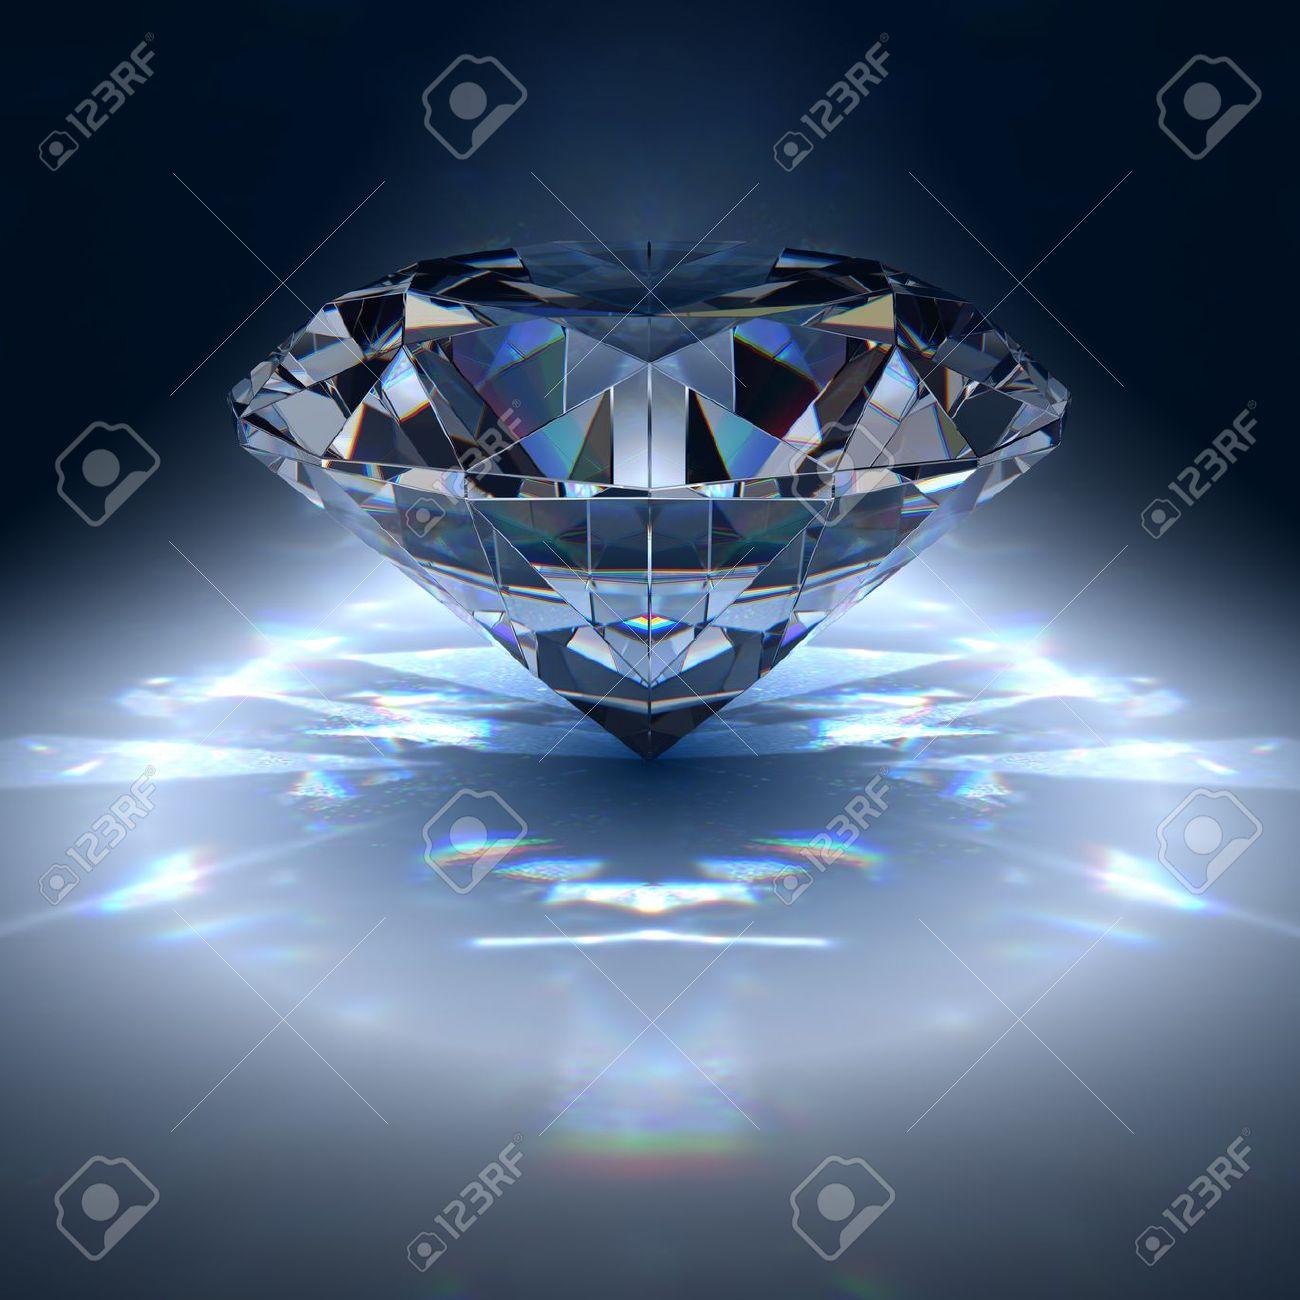 Diamond jewel on blue background - 8000704